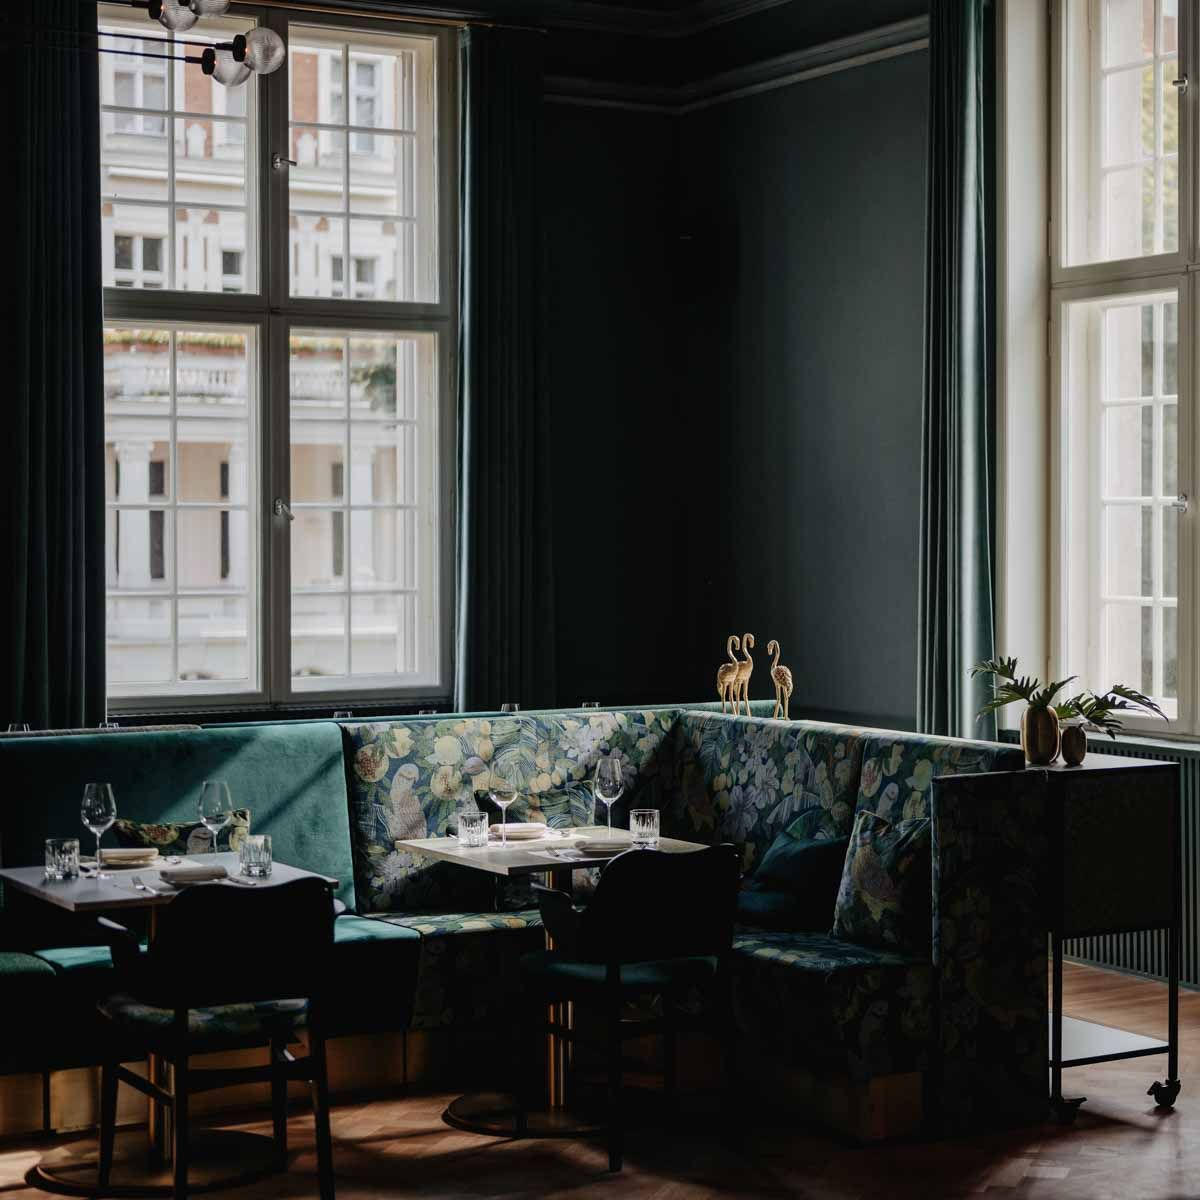 Villa Kellermann In Potsdam Am Heiligen See Berlin Creme Guides In 2020 Restaurant Villa Potsdam